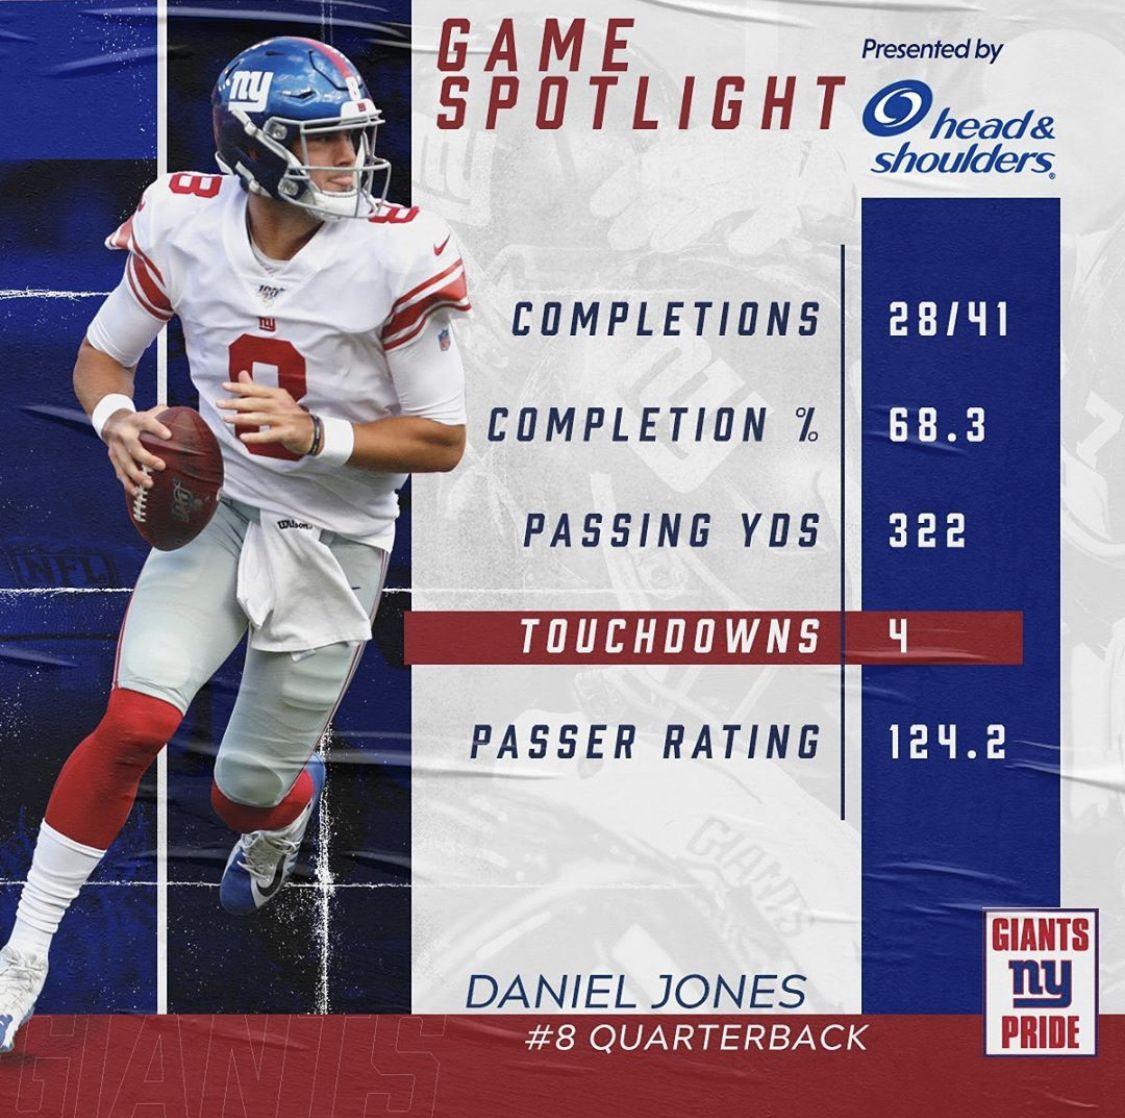 Pin By Daniel Son On Daniel Jones Nyg New York Giants Game Presents Baseball Cards